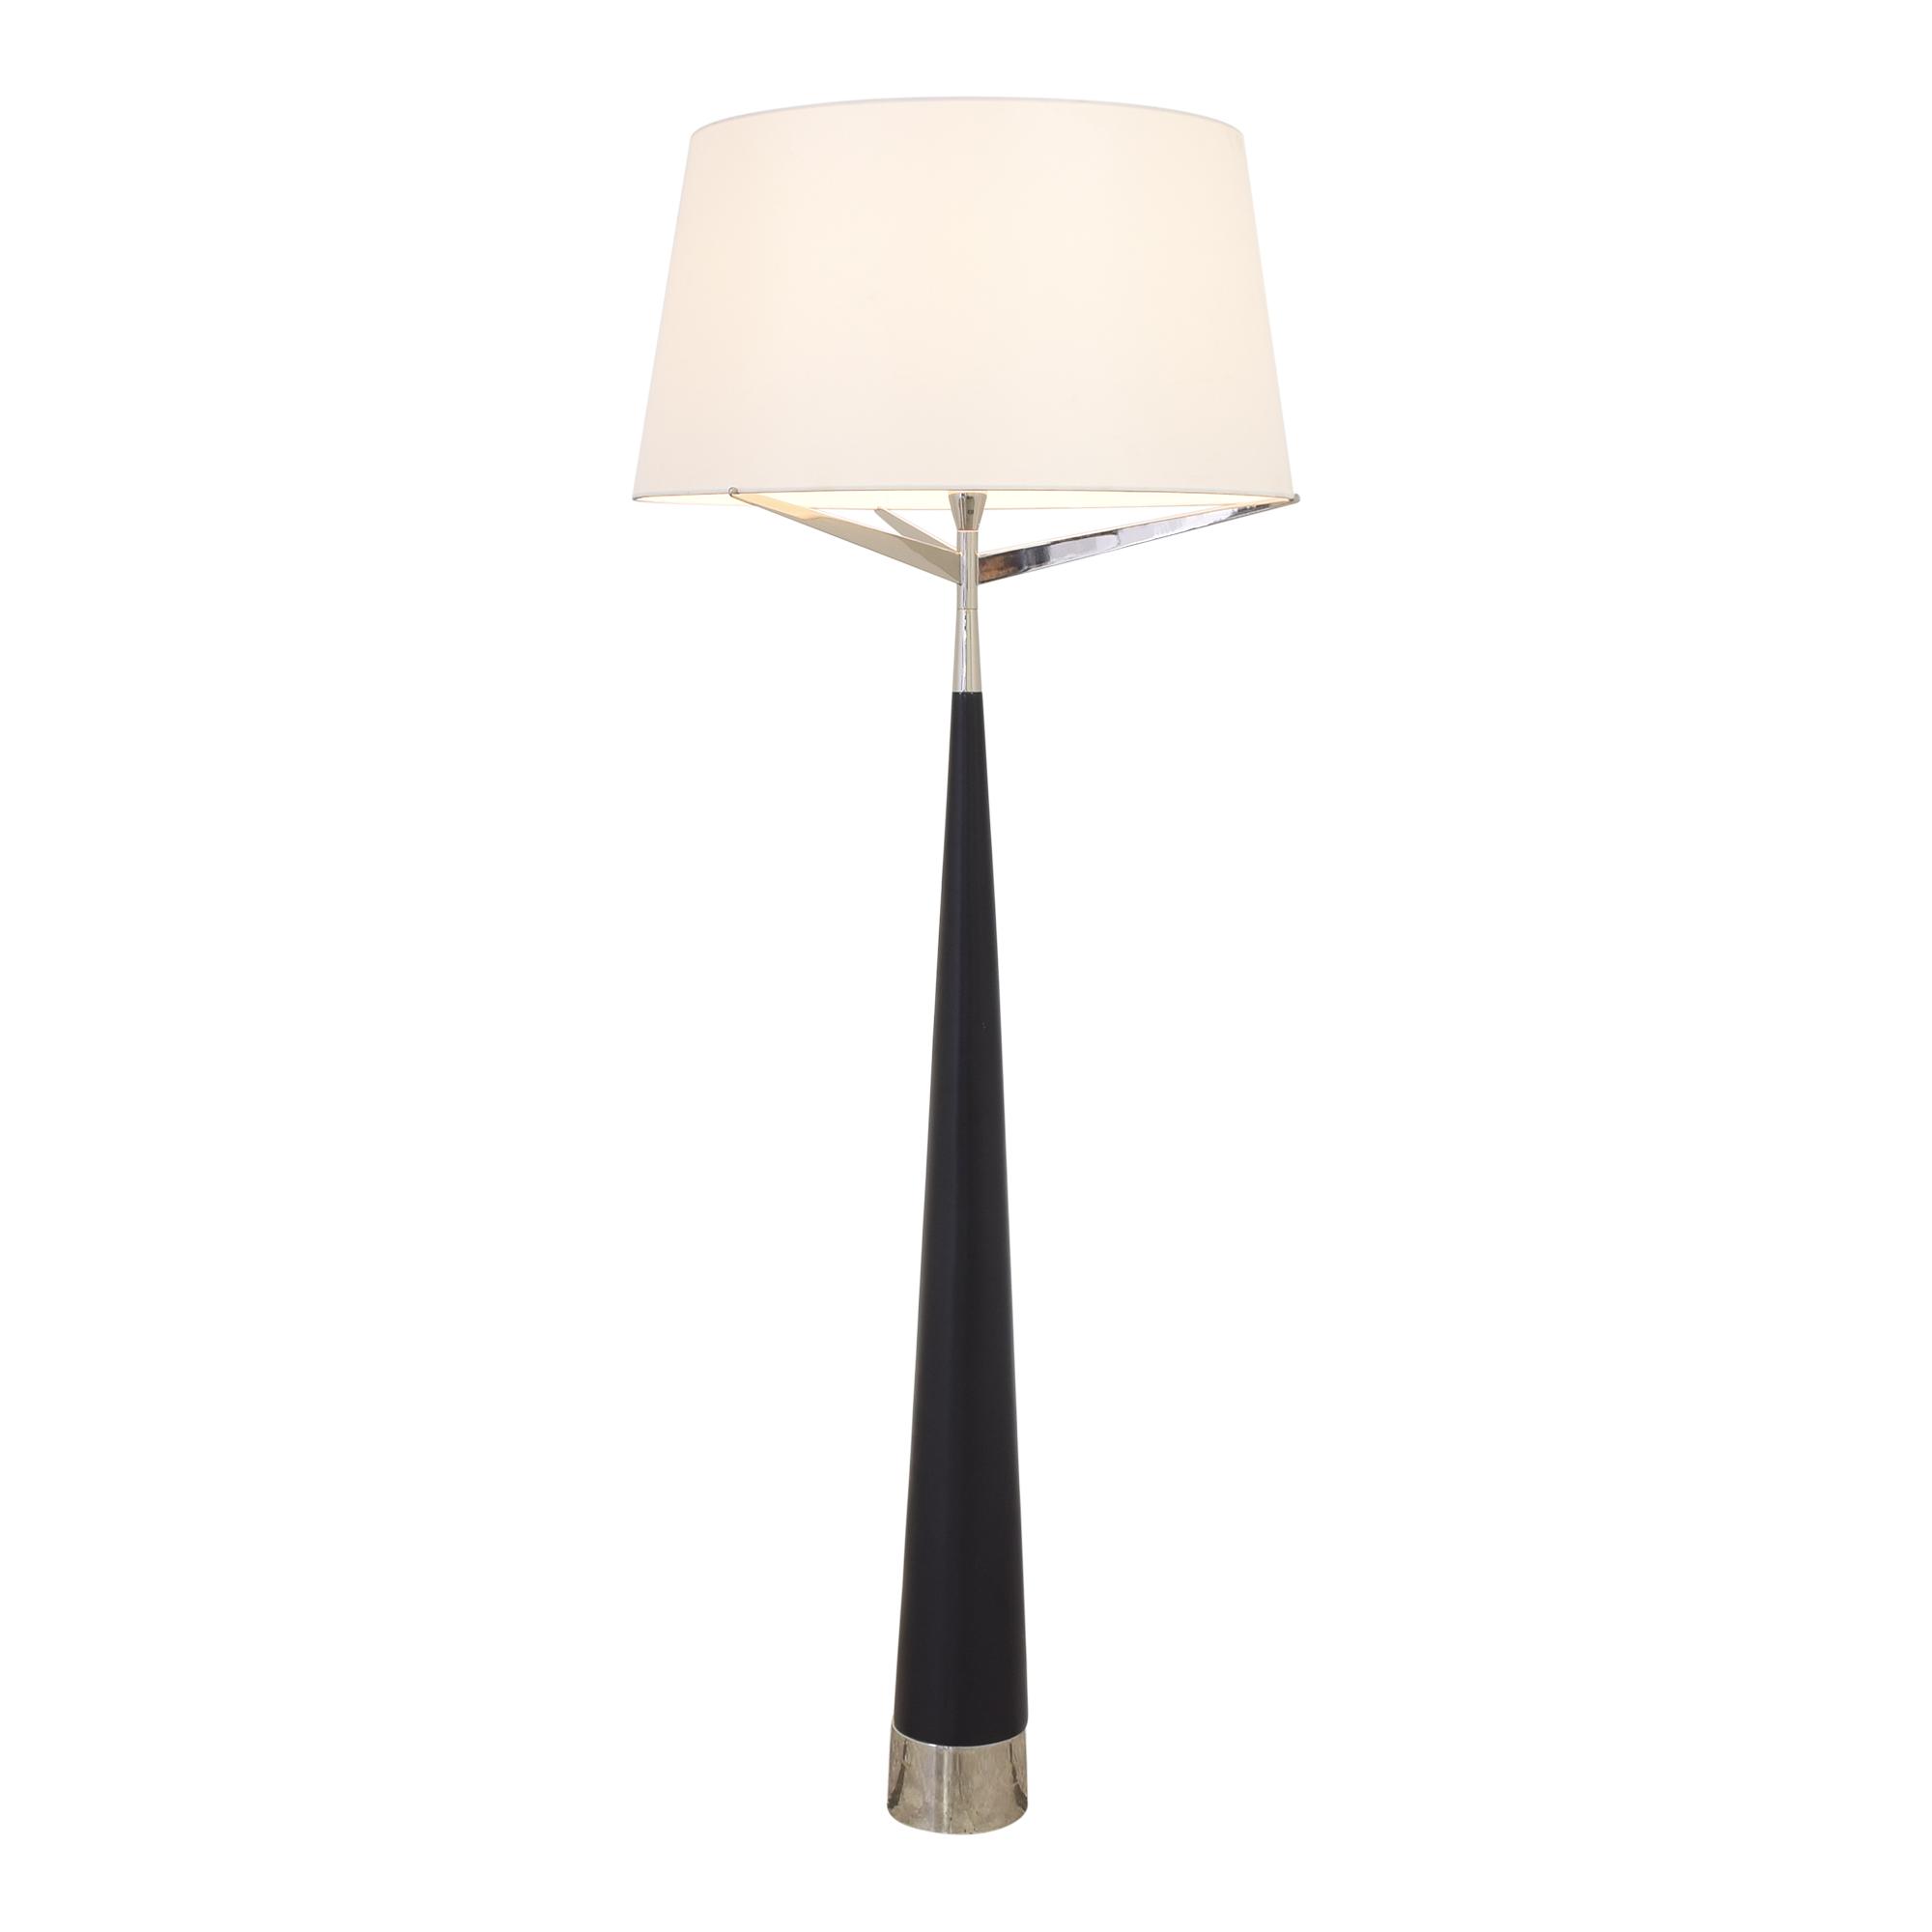 Mitchell Gold + Bob Williams Mitchell Gold + Bob Williams Luca Floor Lamp Lamps